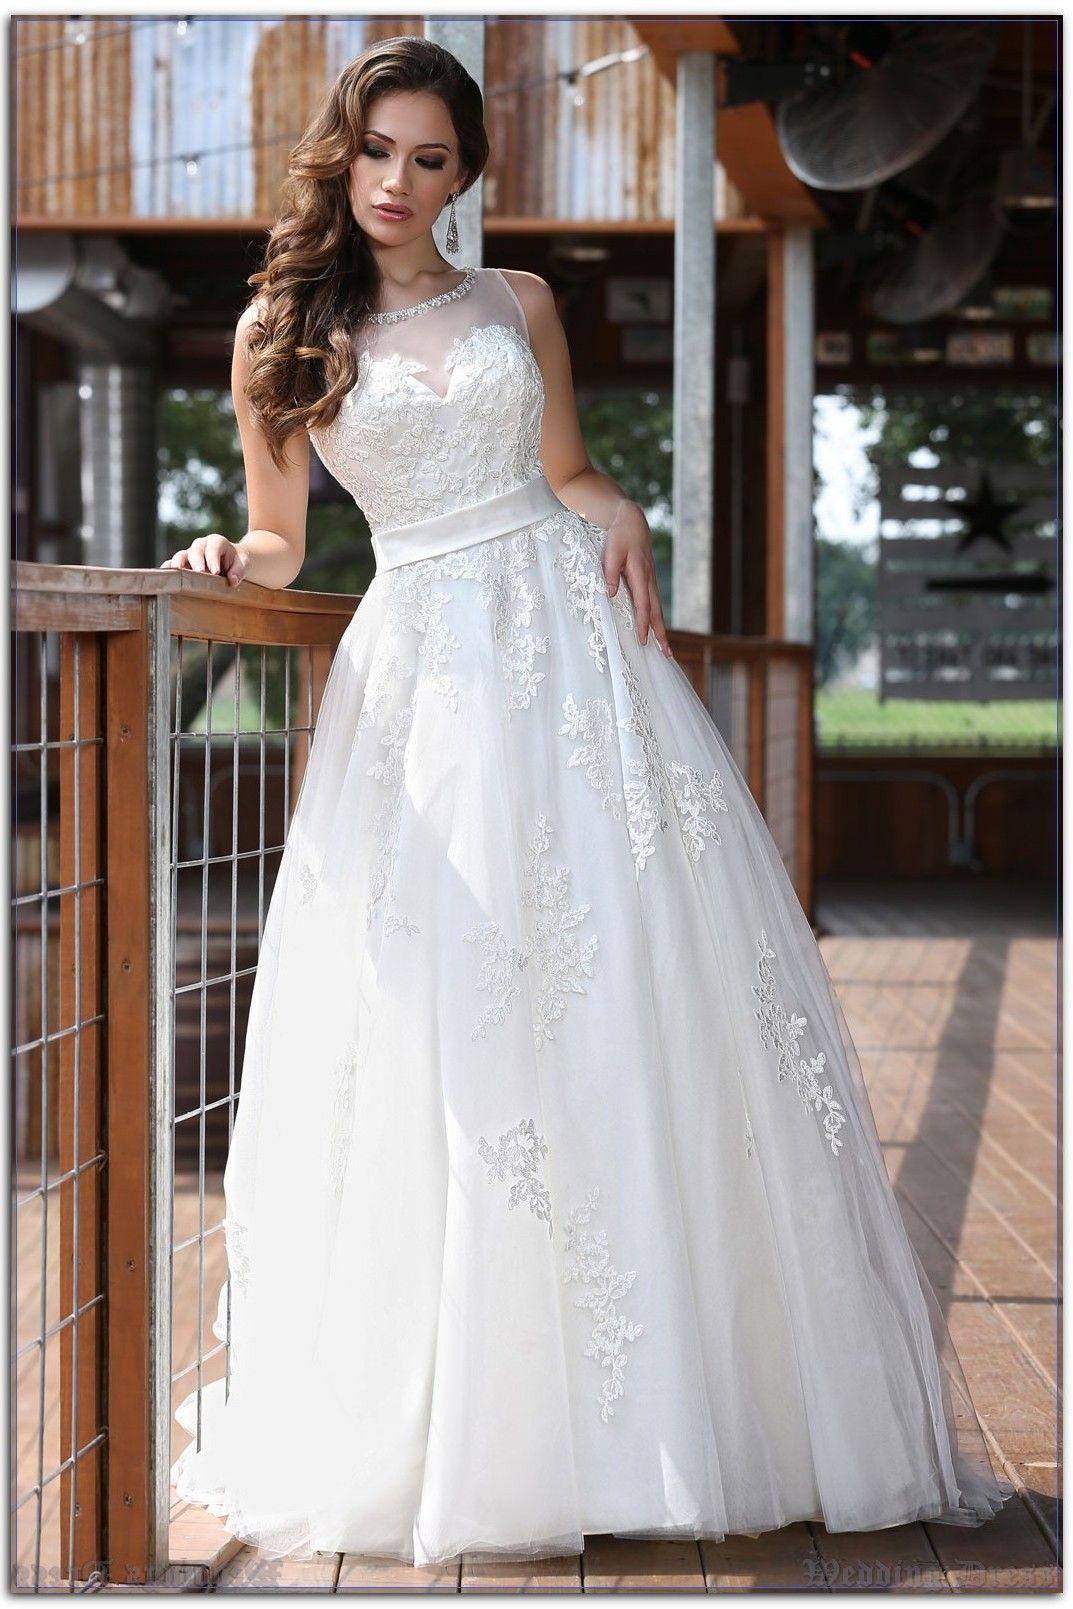 52 Ways To Avoid Weddings Dress Burnout